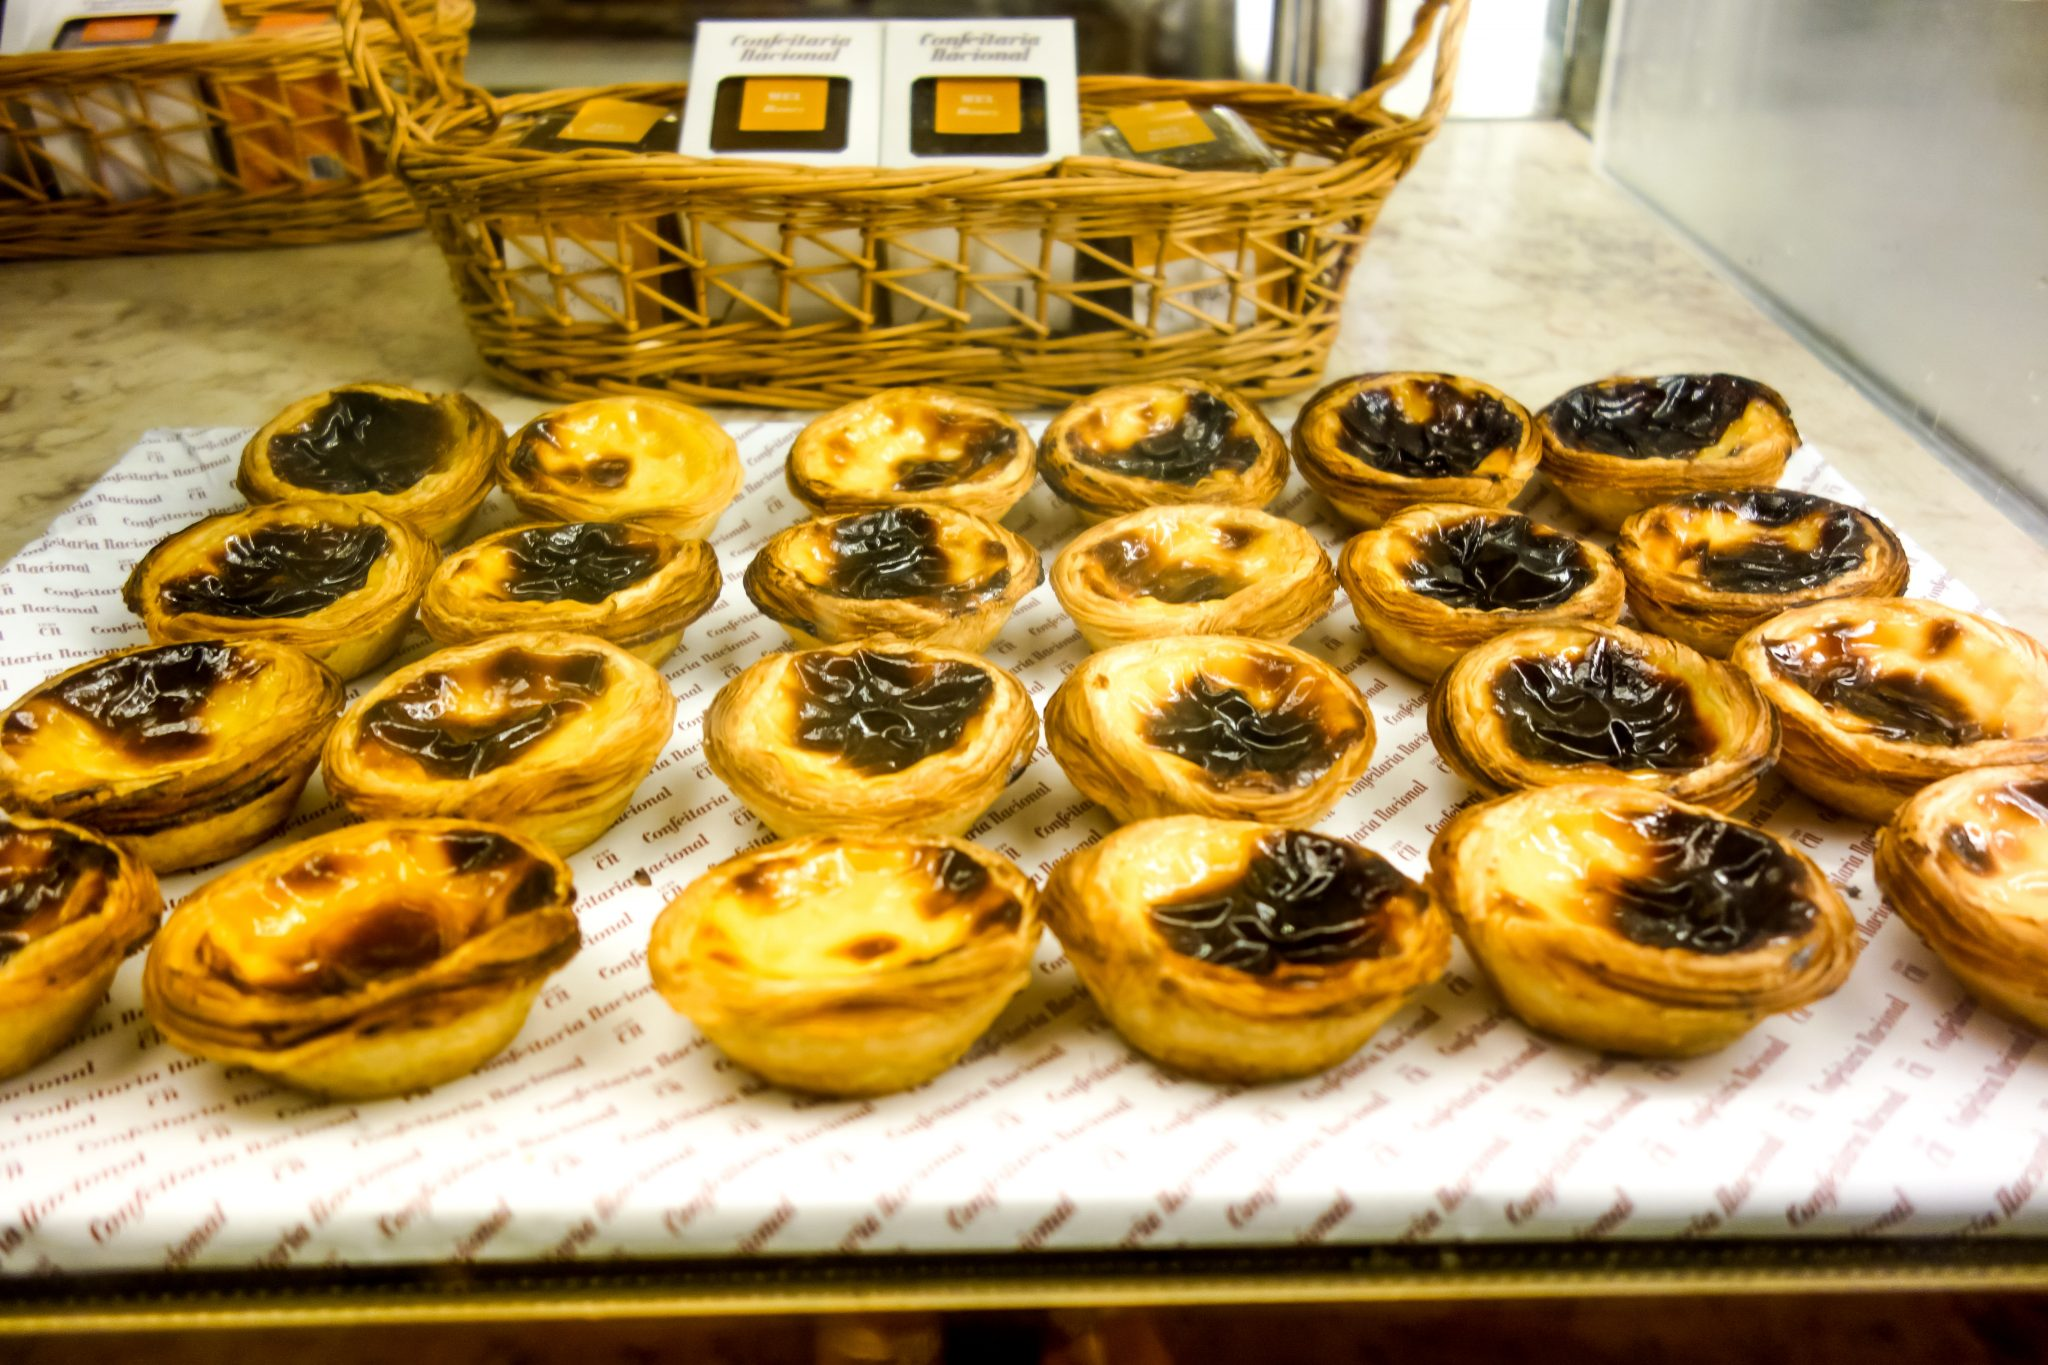 Portugal, süße Spezialität (unbedingt probieren!!!)